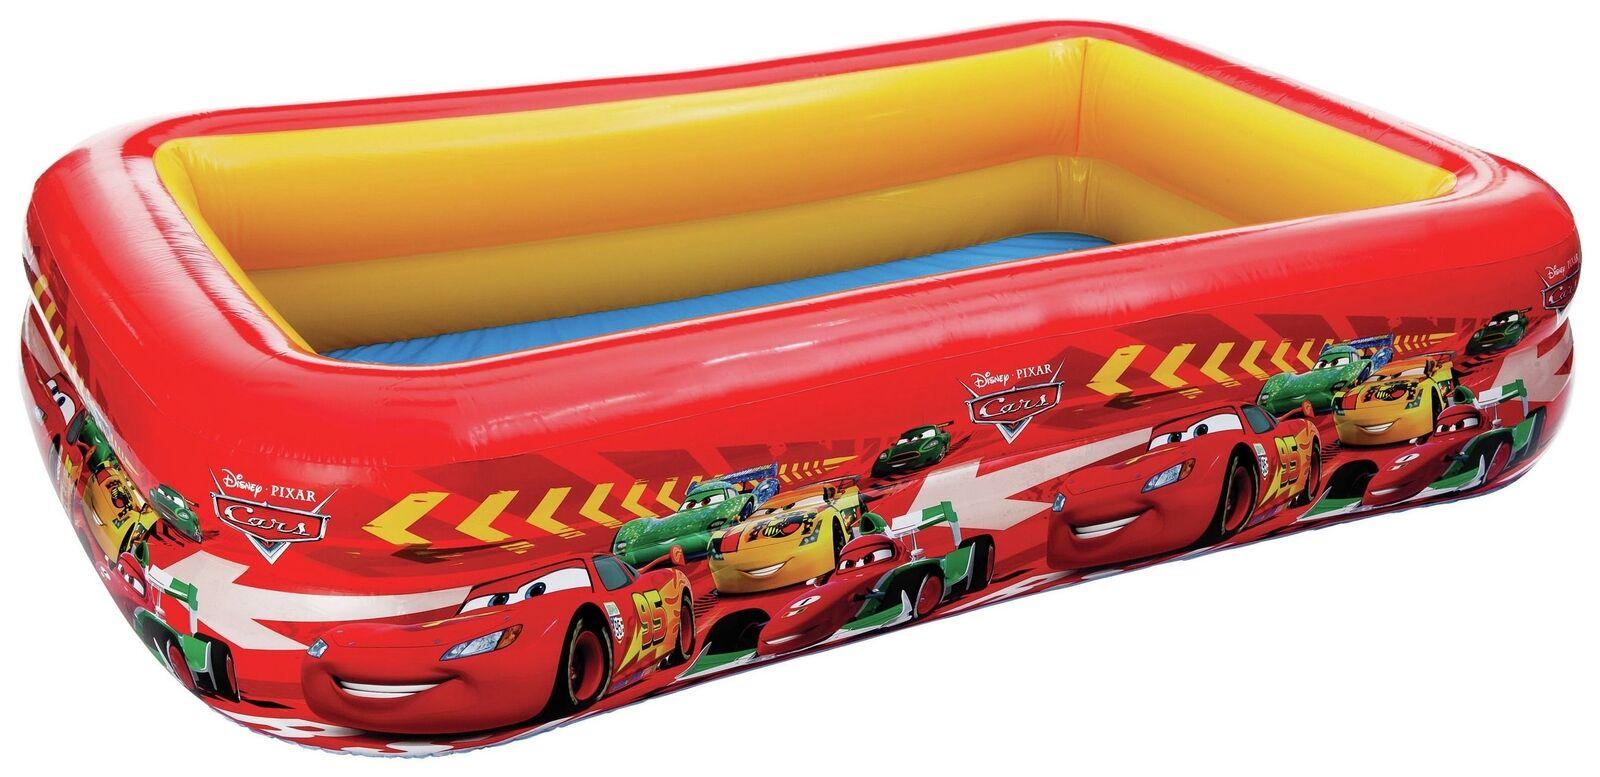 Disney Cars 262 x 175cm Rectangular Inflatable Children's Paddling Pool - 770L £11.99 delivered (UK Mainland) @ Argos on eBay